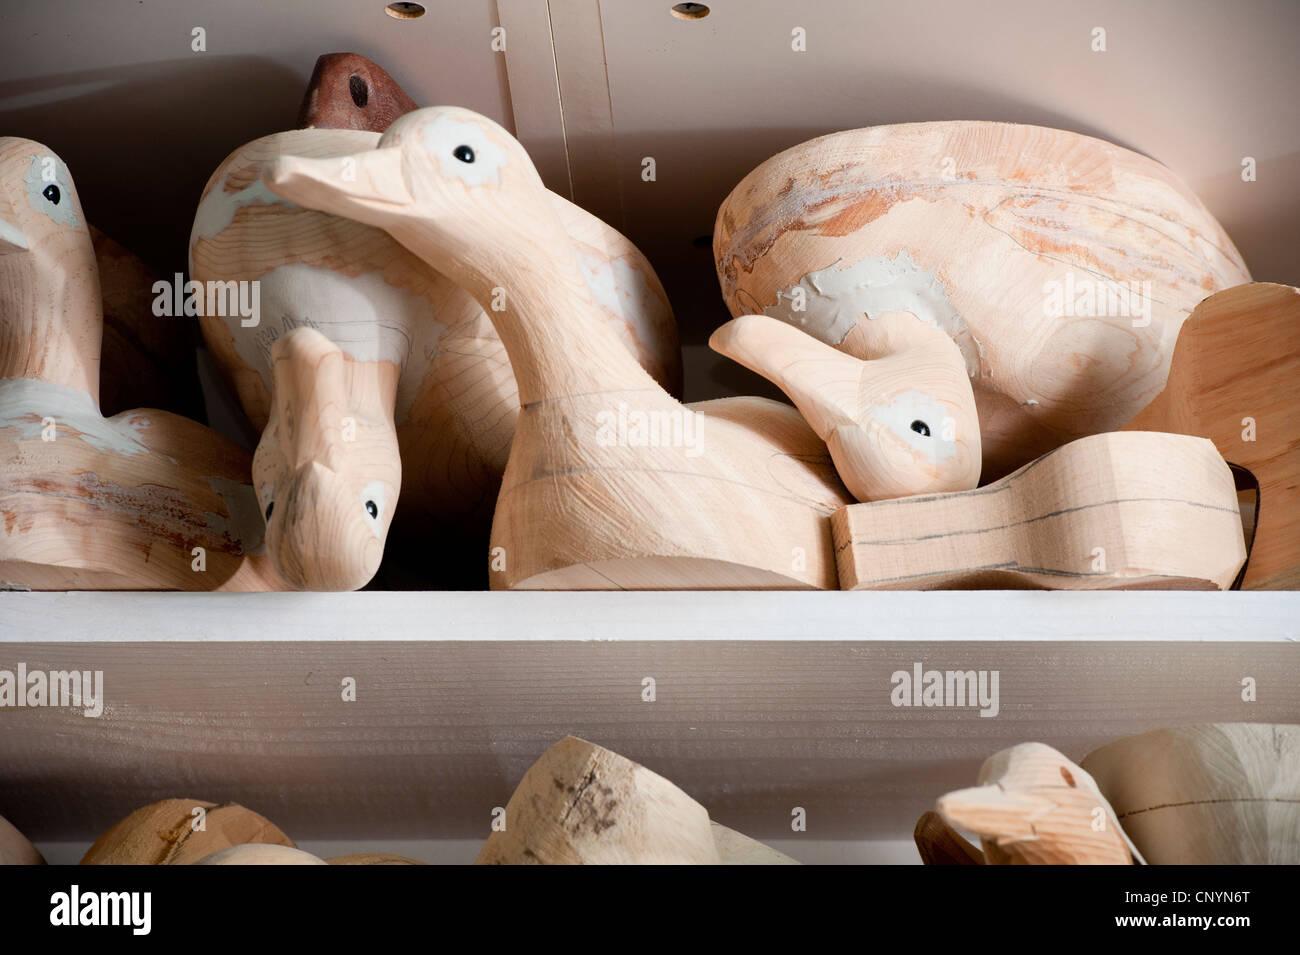 Unpainted Wooden Decoy Ducks On A Shelf Stock Photo 47937872 Alamy